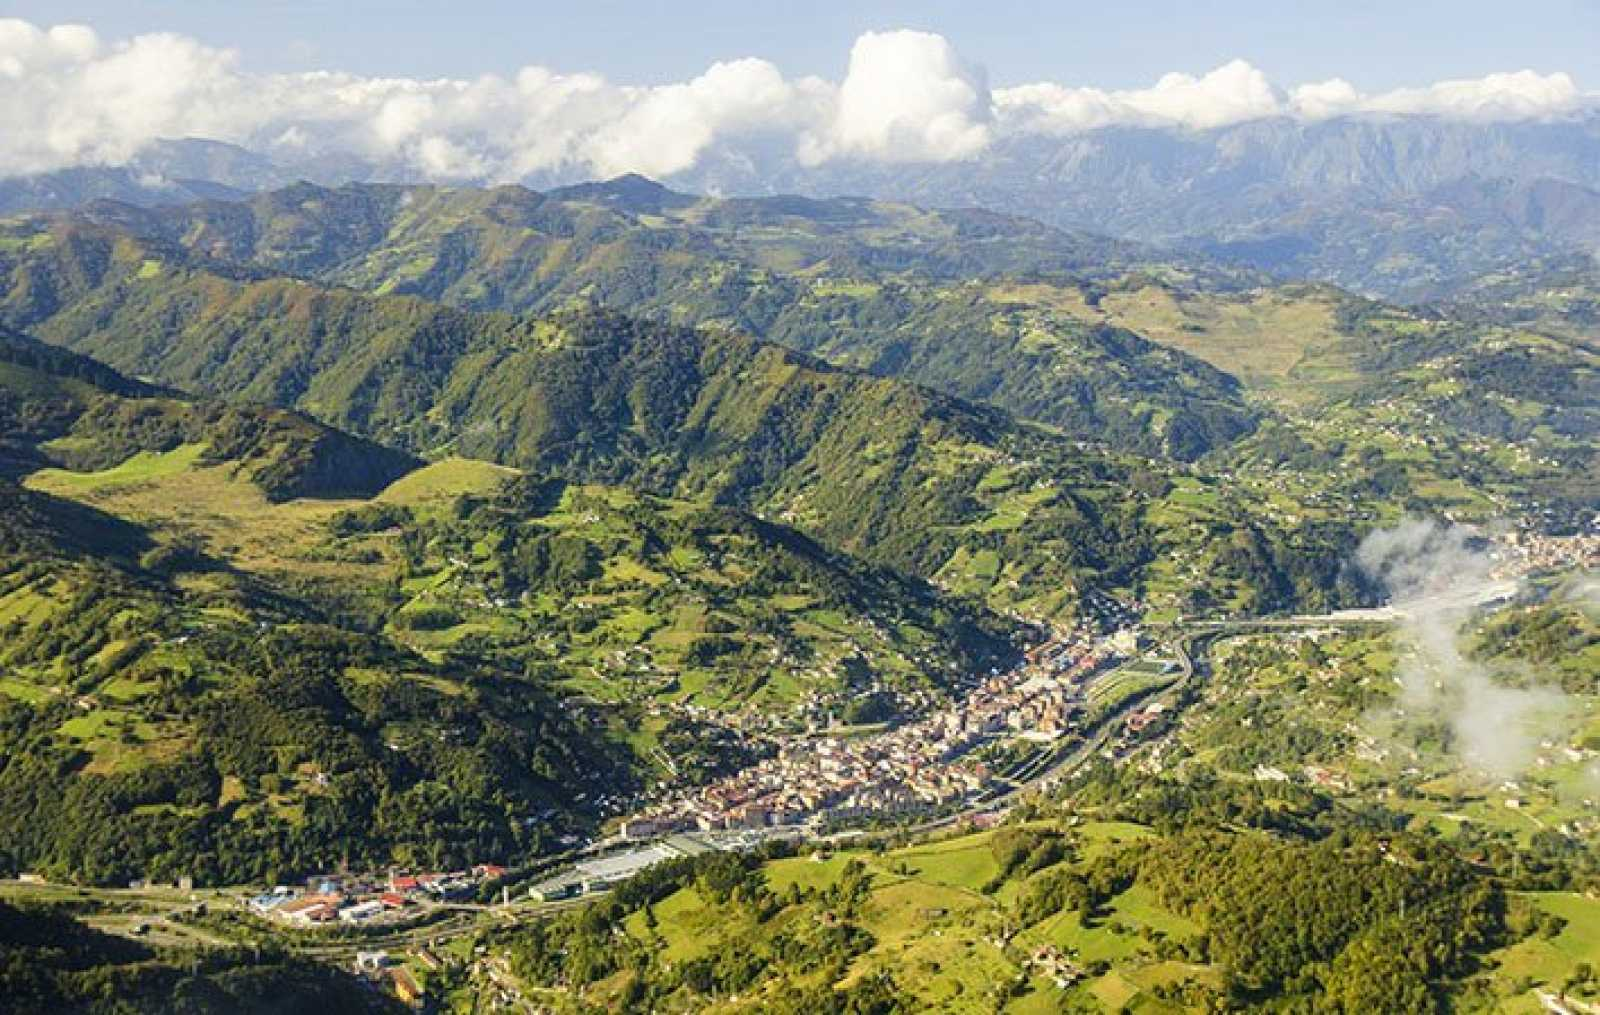 Cuenca minera 'Turismo de Asturias'